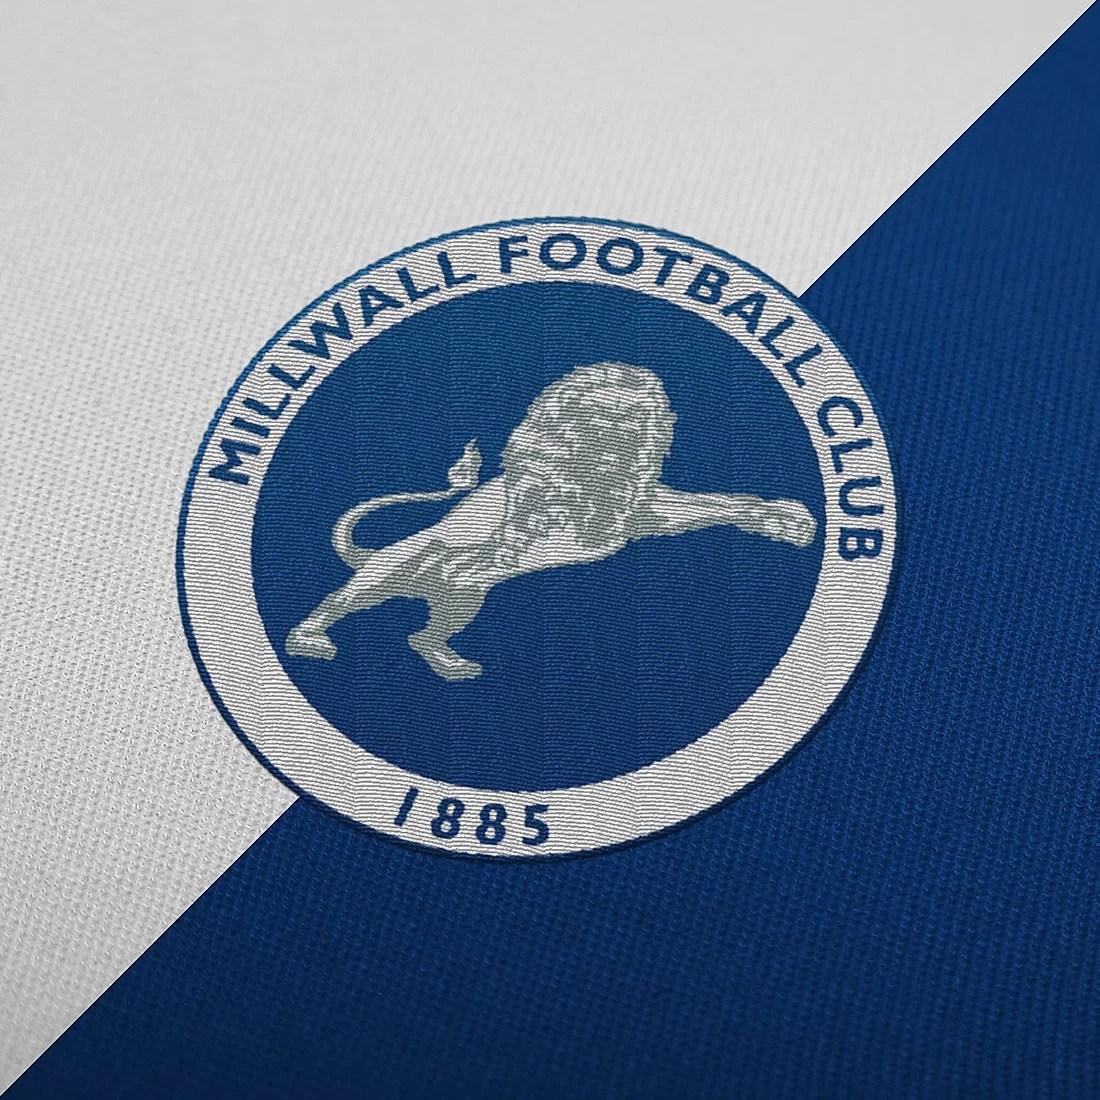 Stroje piłkarskie Millwall embroidered logo